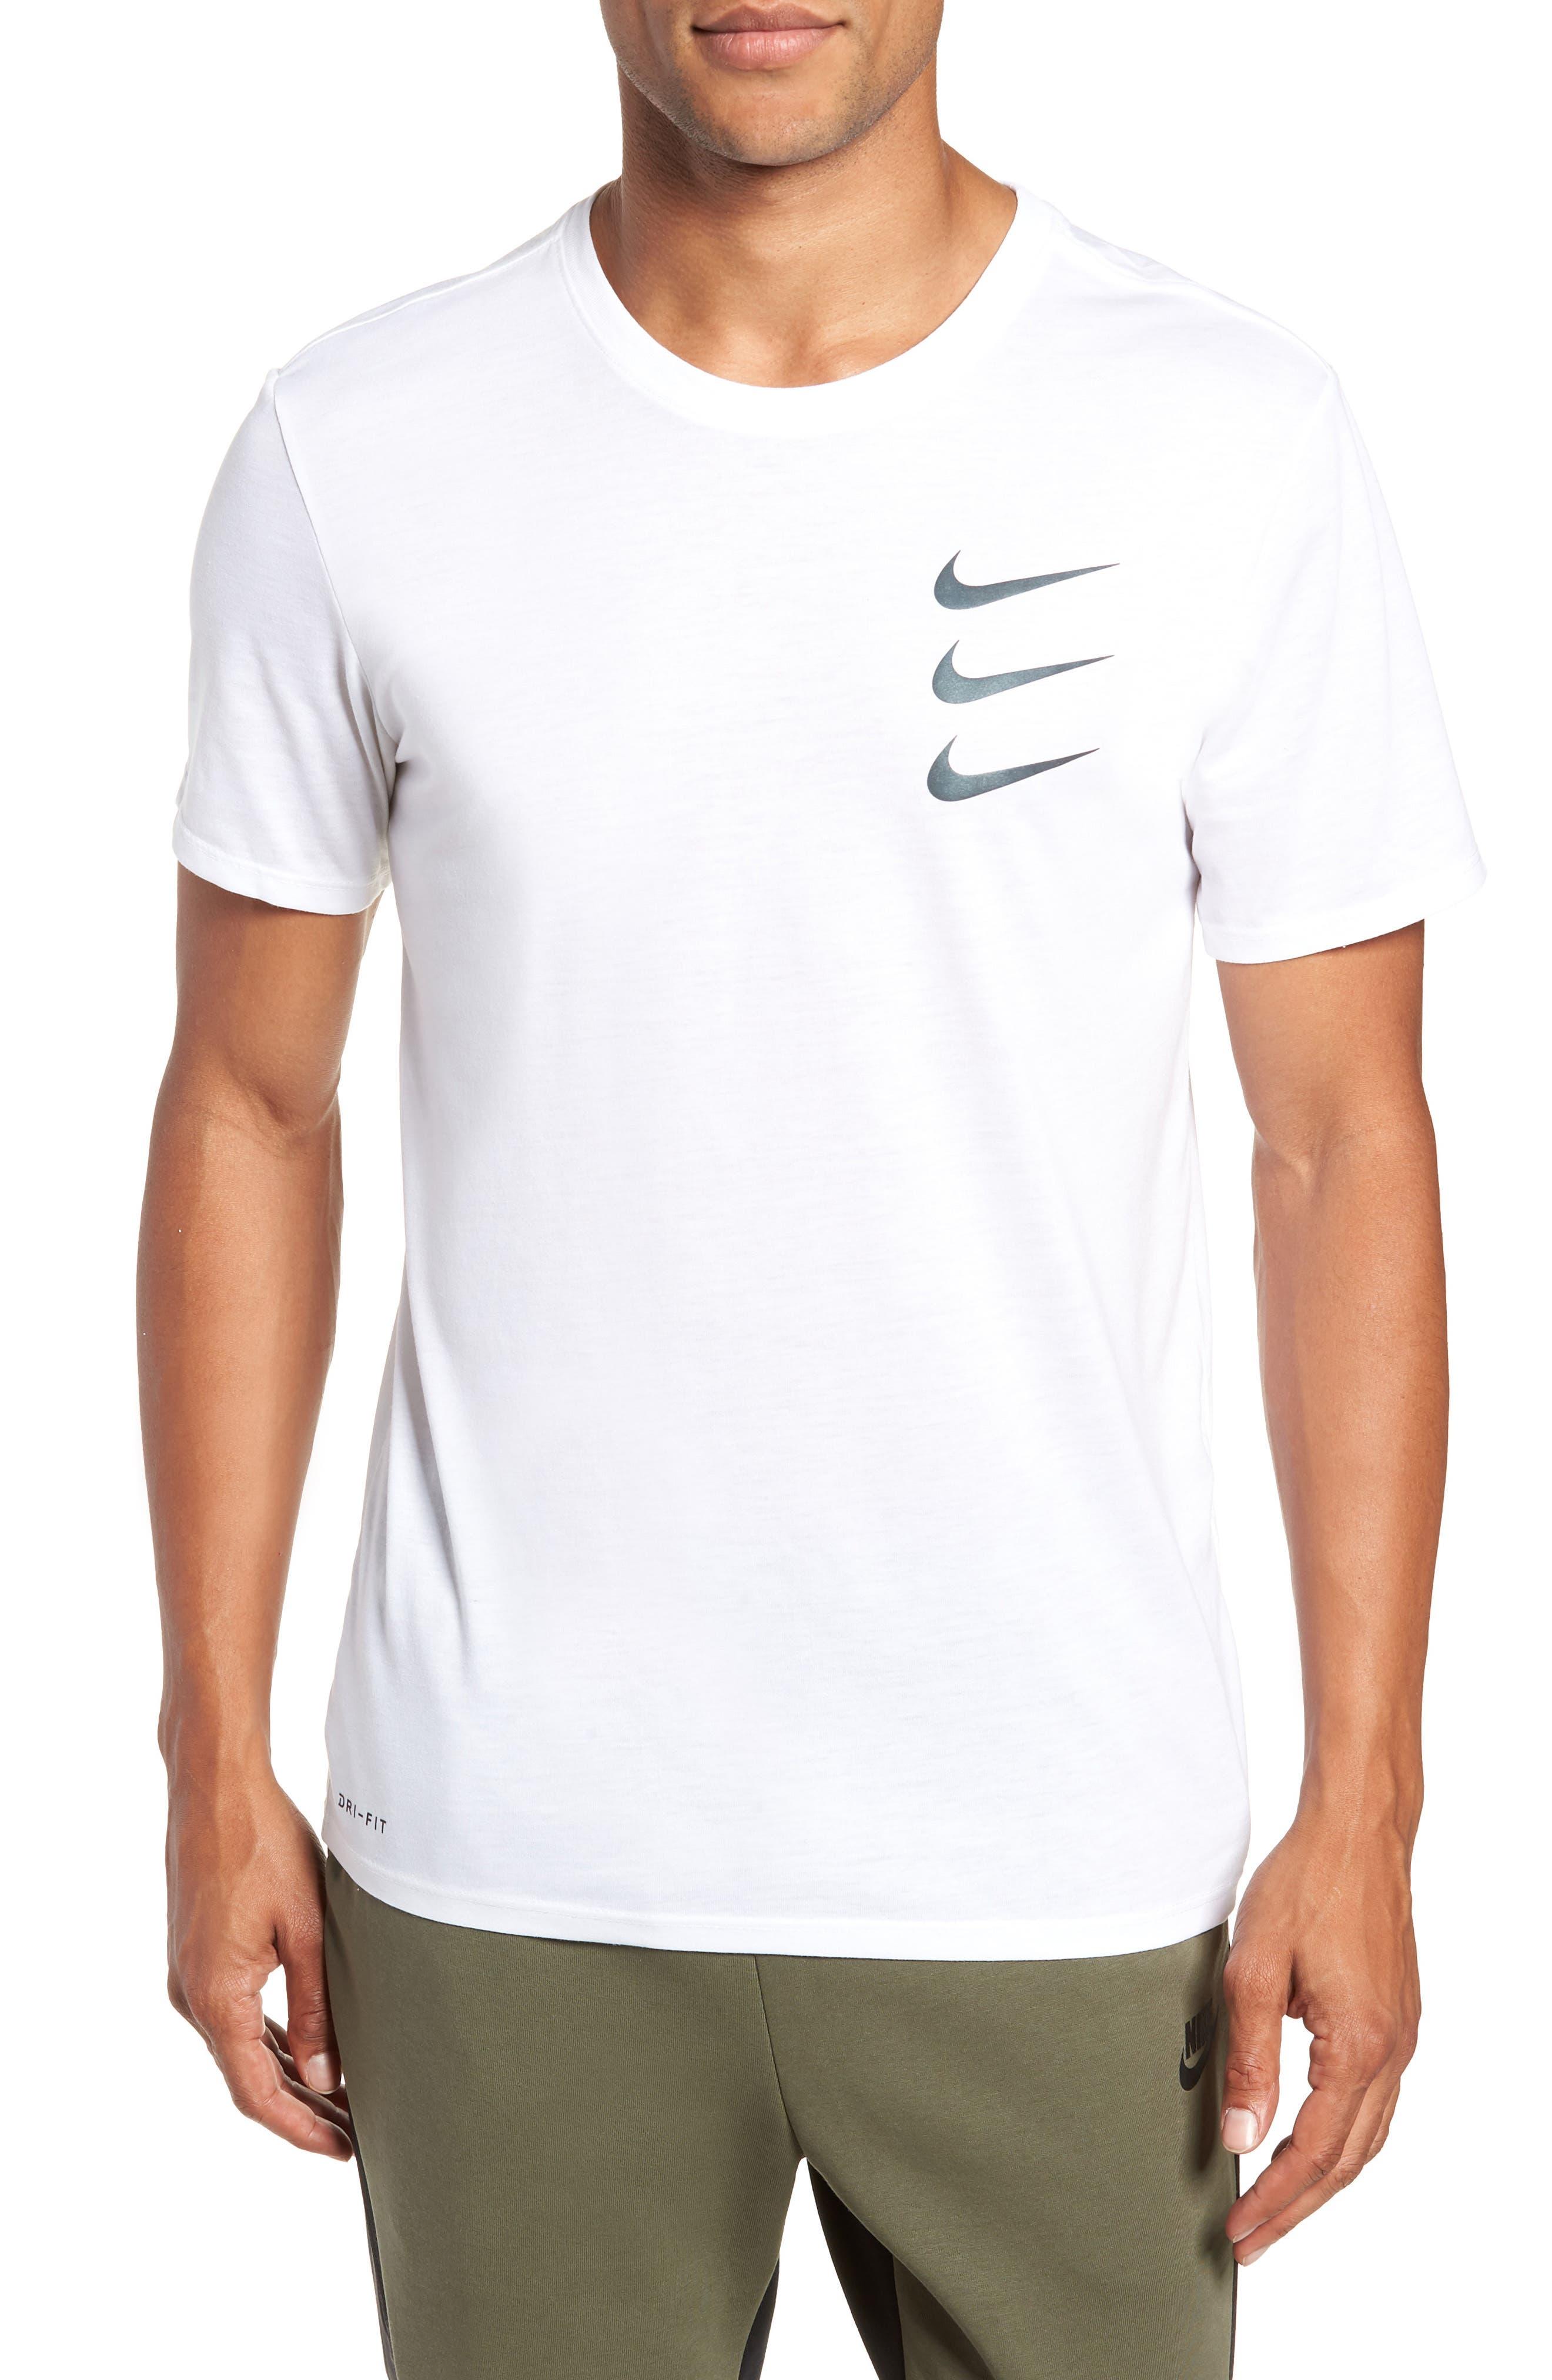 Dry Running Division T-Shirt,                         Main,                         color, WHITE/ GUNSMOKE